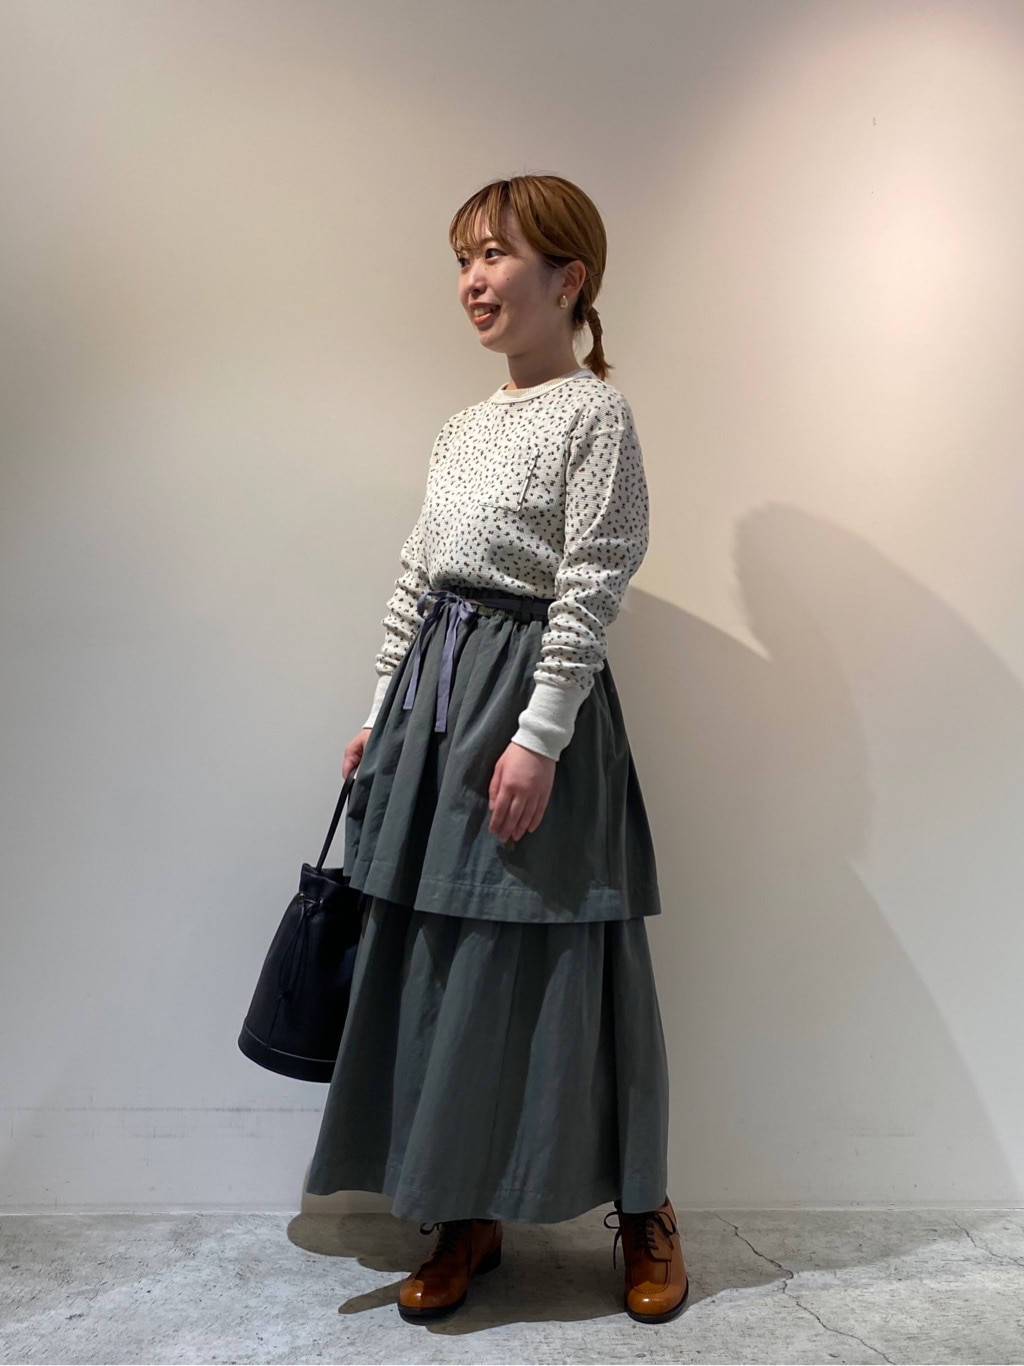 chambre de charme 京都路面 身長:150cm 2020.09.06